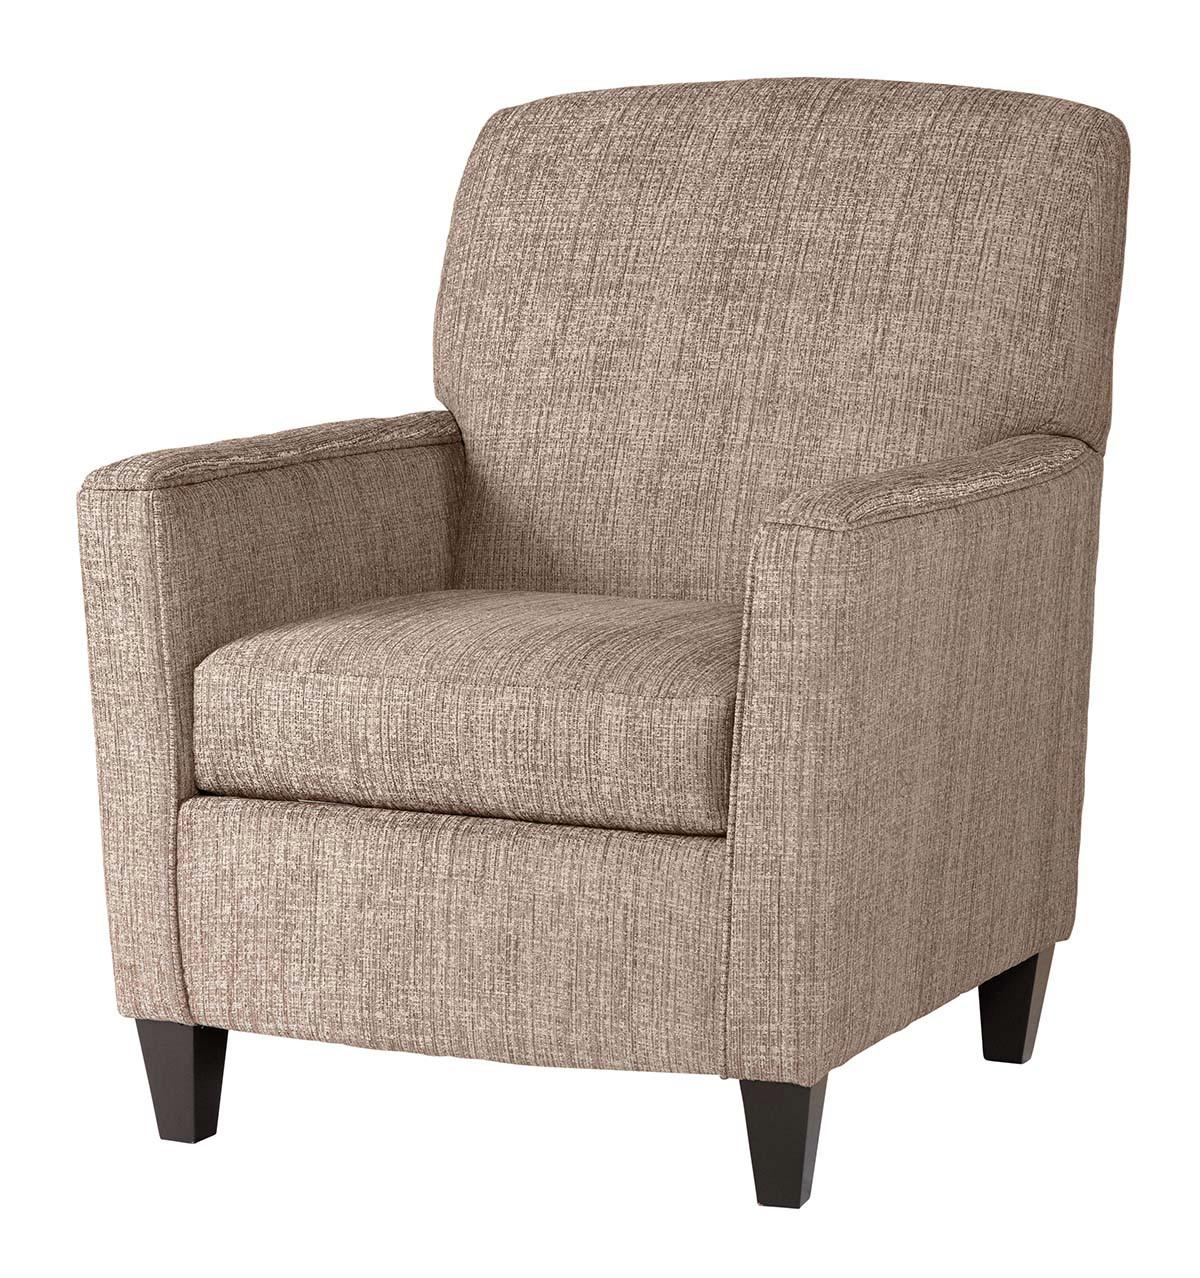 35FOHE Serta Accent Chair